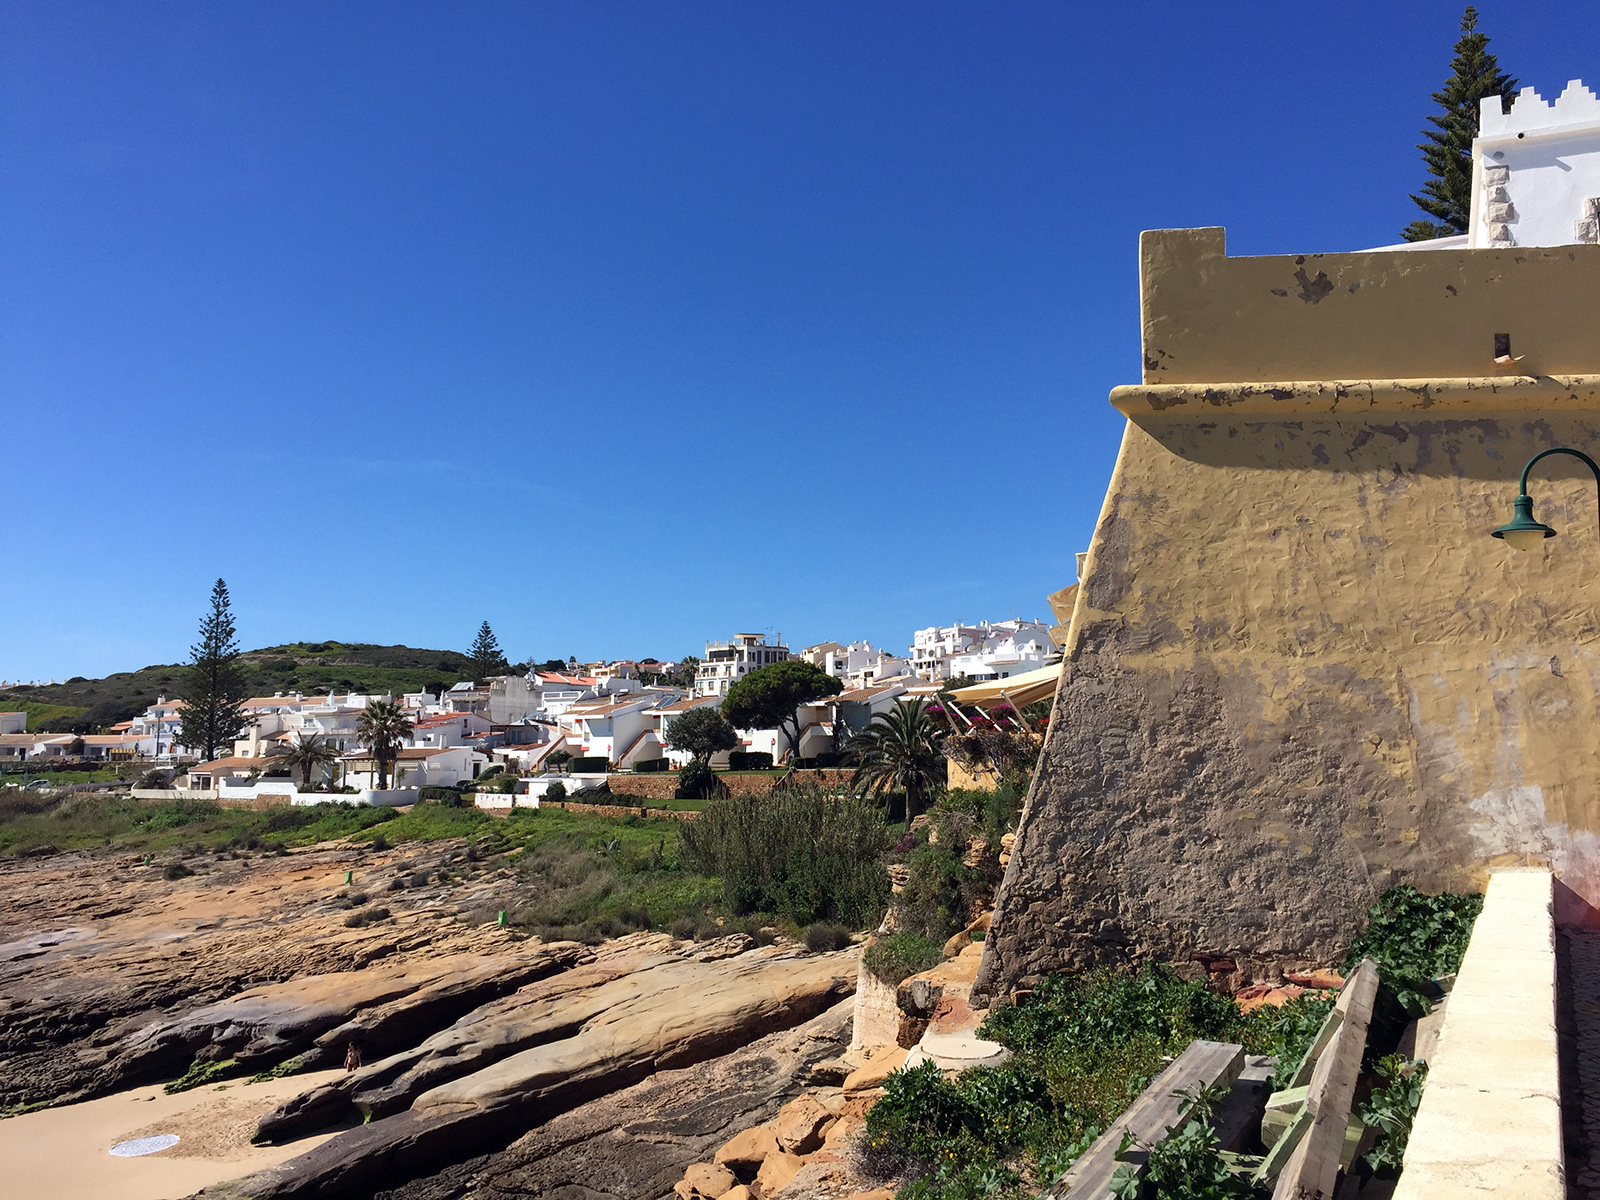 Praia da Luz, Portugal by Jets Like Taxis